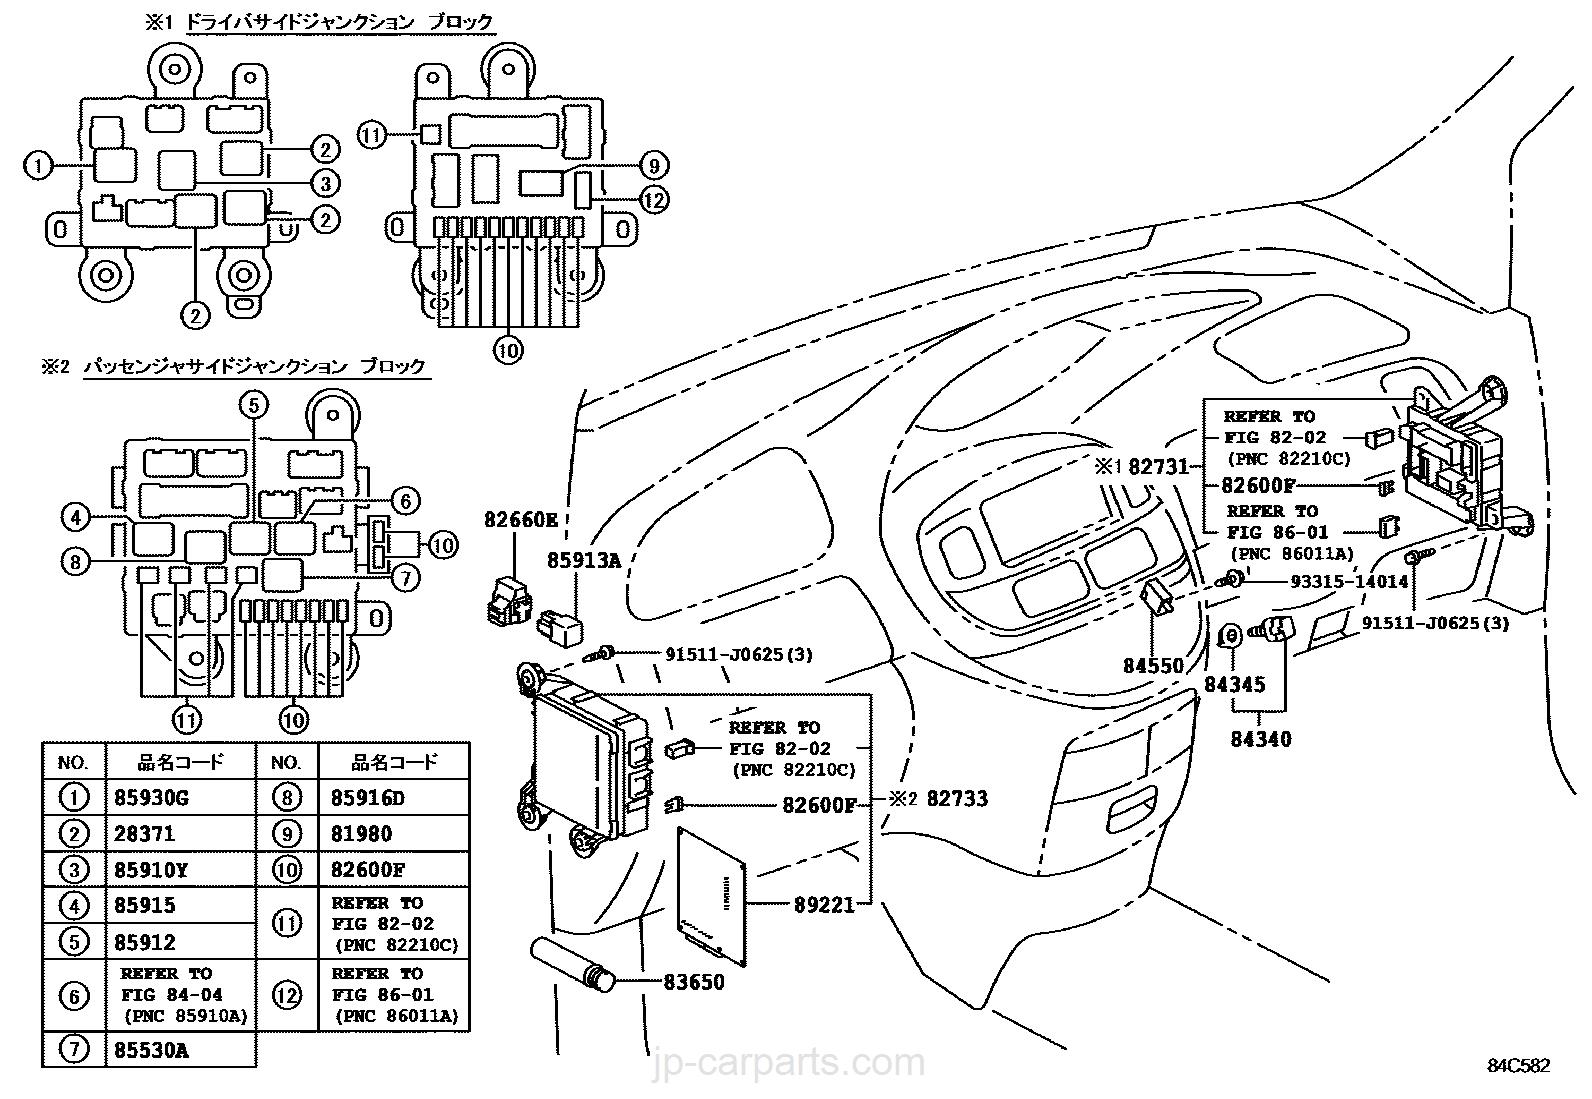 hight resolution of 652150 8401 0008 switch relay computer toyota part list jp carparts com toyota estima fuse